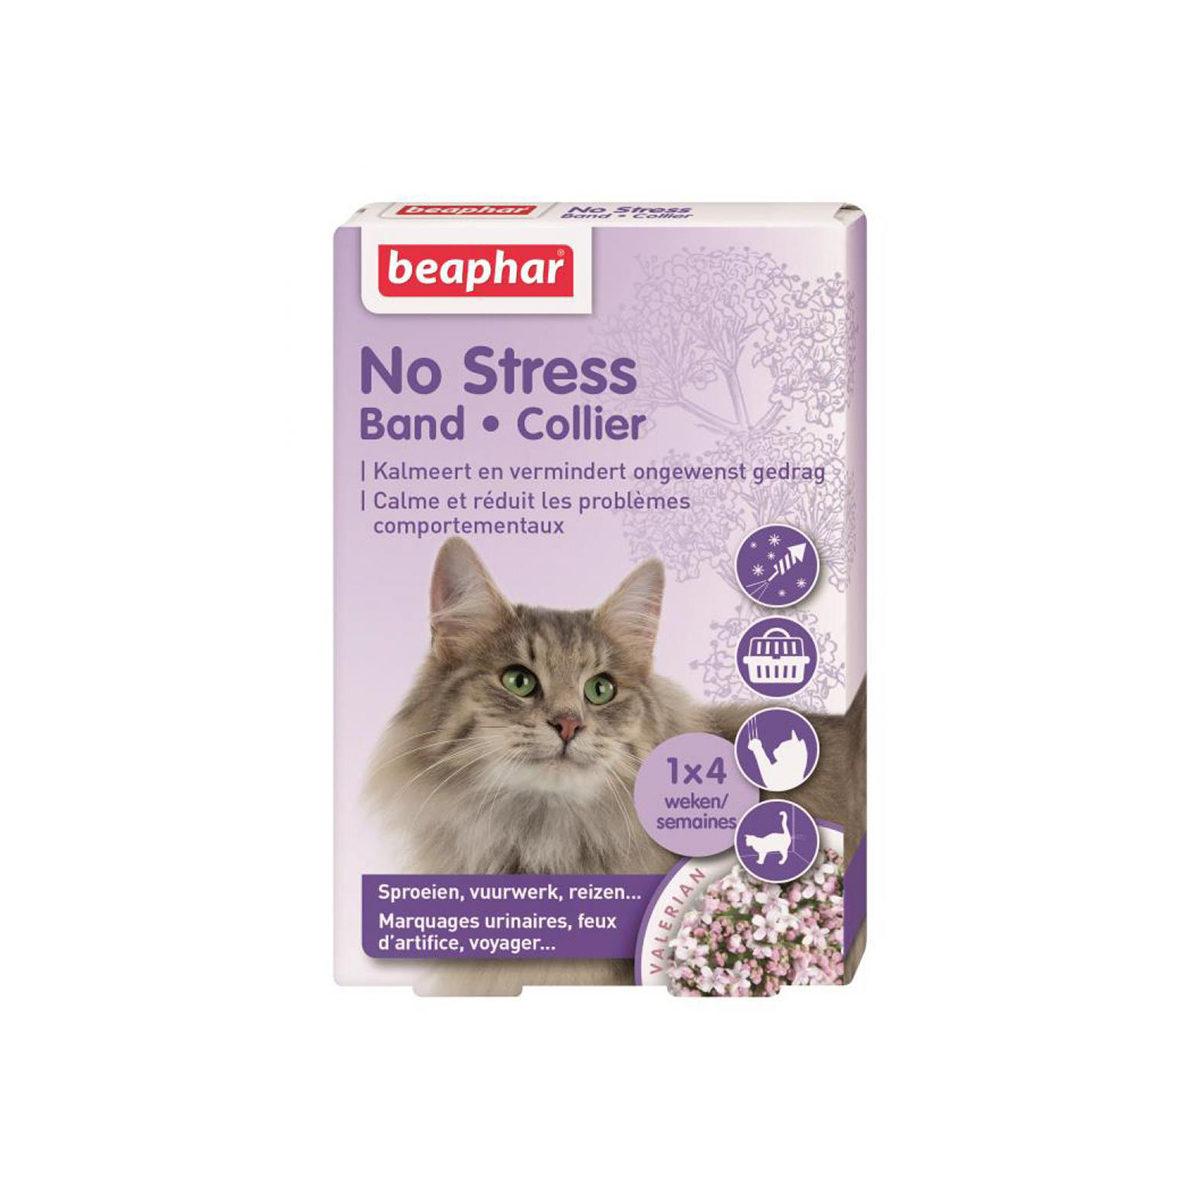 Beaphar No Stress Band Kat - in Tuigjes & Halsbanden